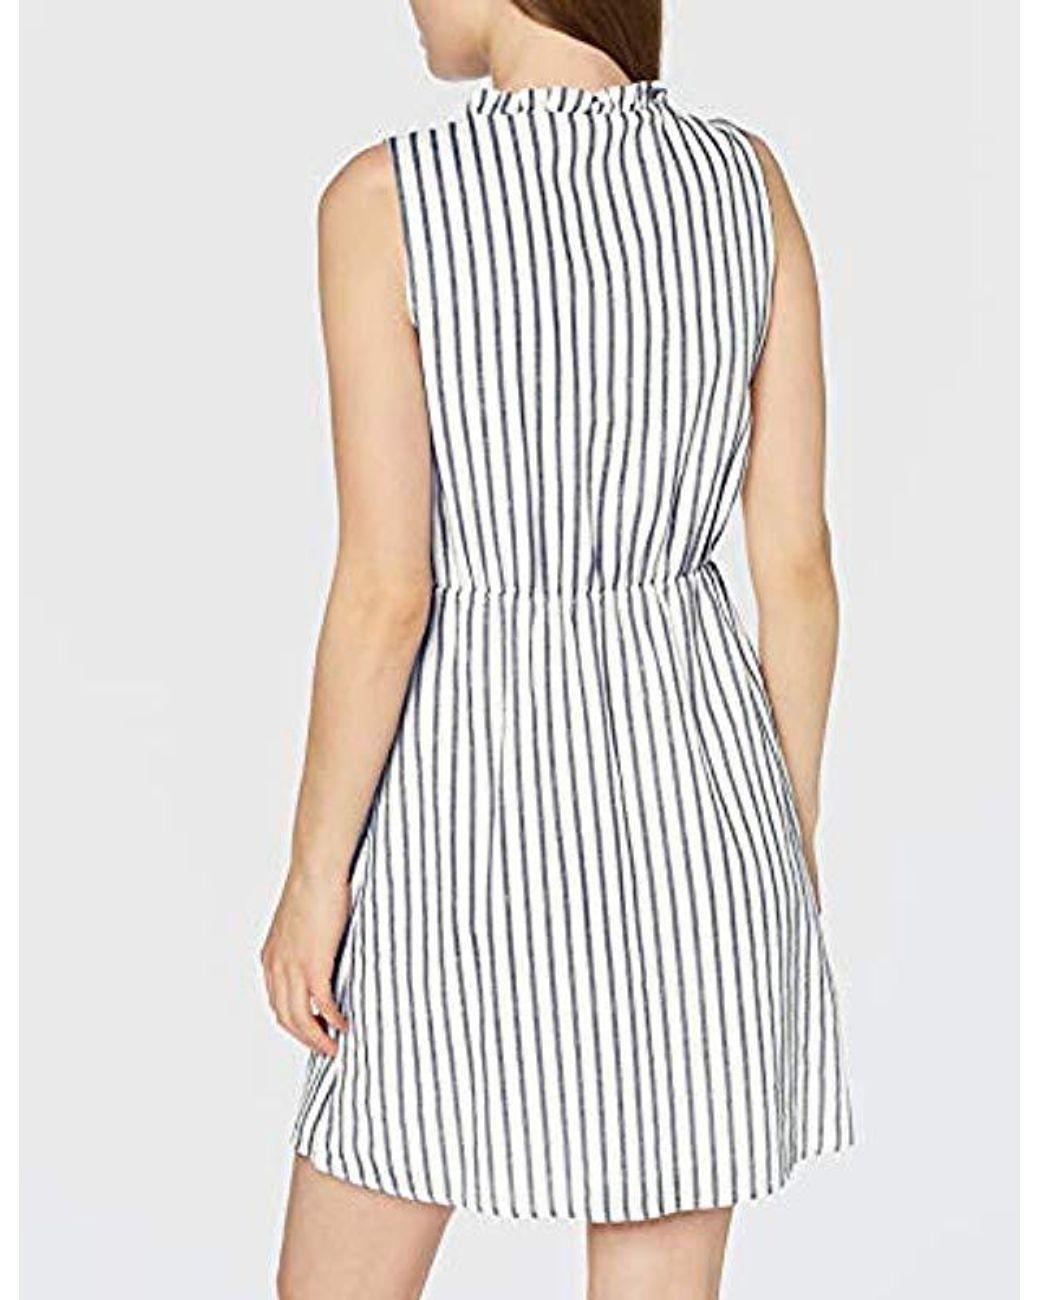 vero moda damen vmenjoy sl wvn top tops, t-shirts & blusen damen